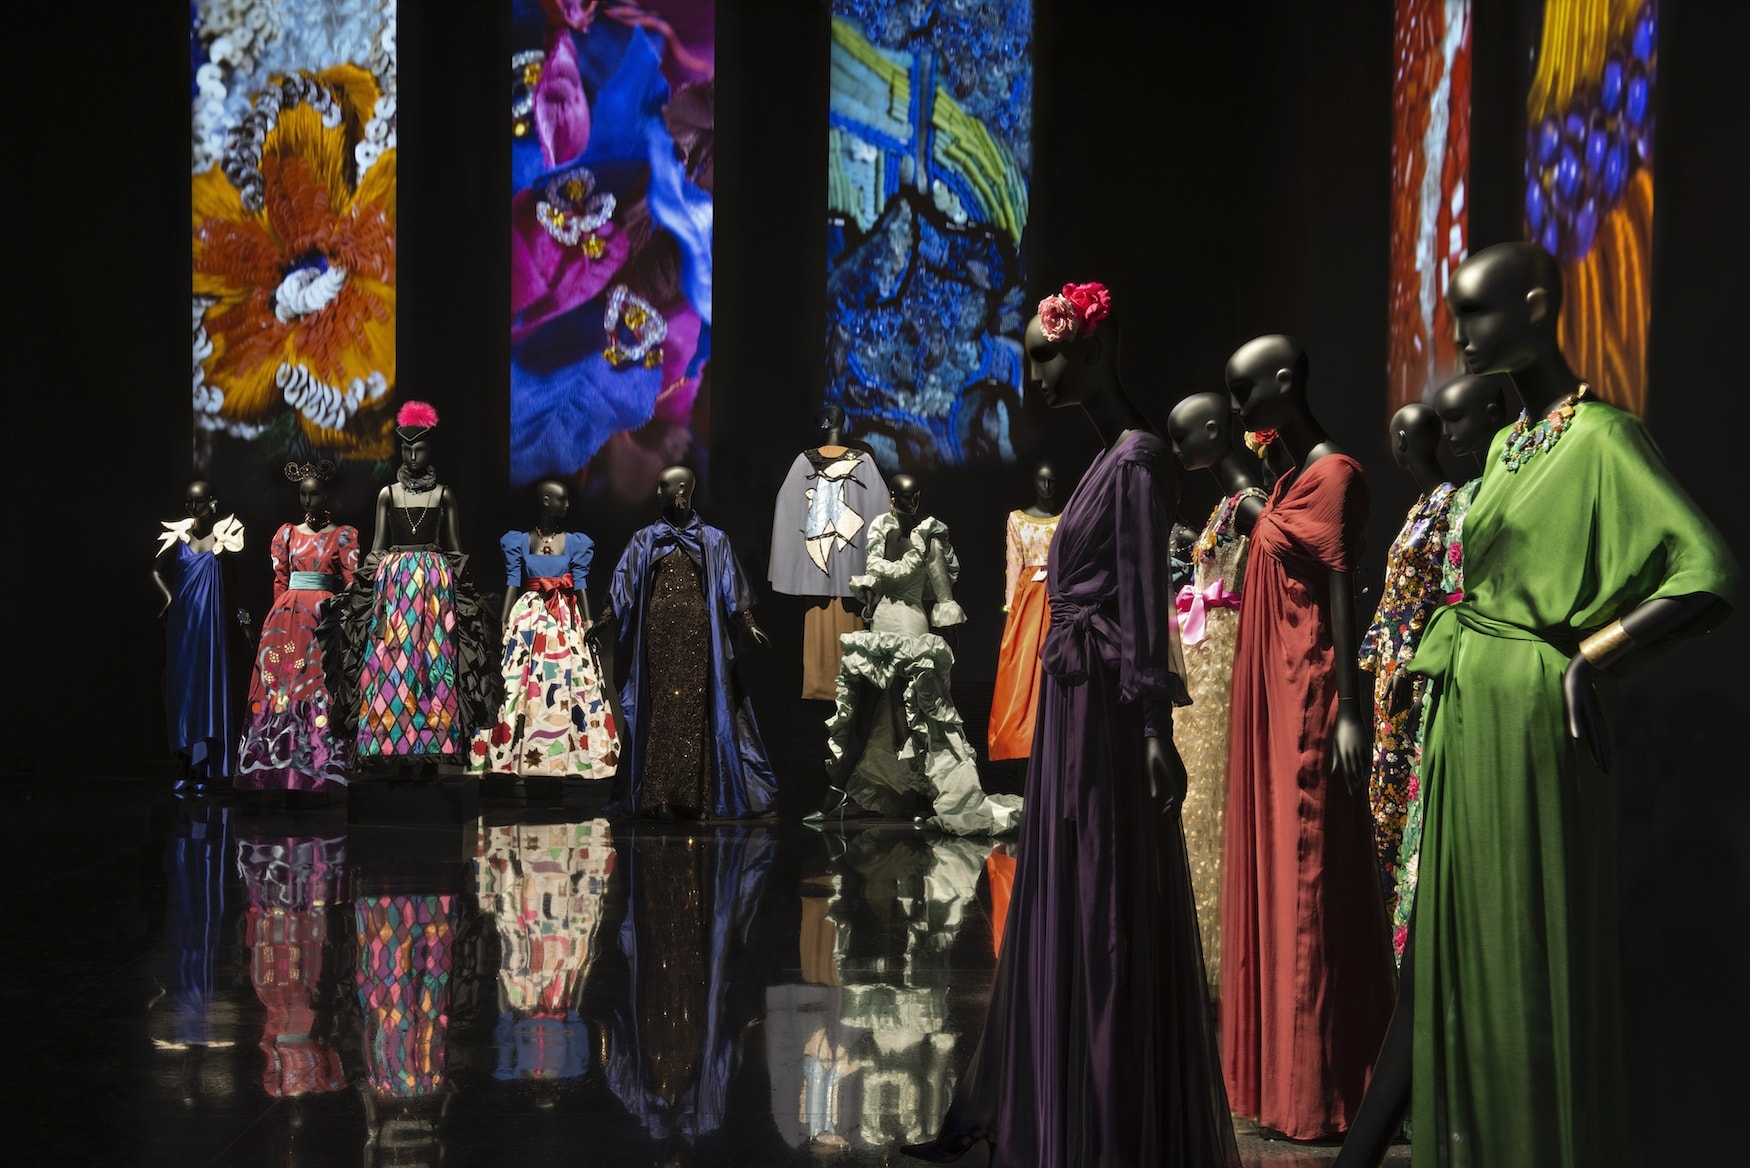 YSL Museum in Marrakesch - Kreative